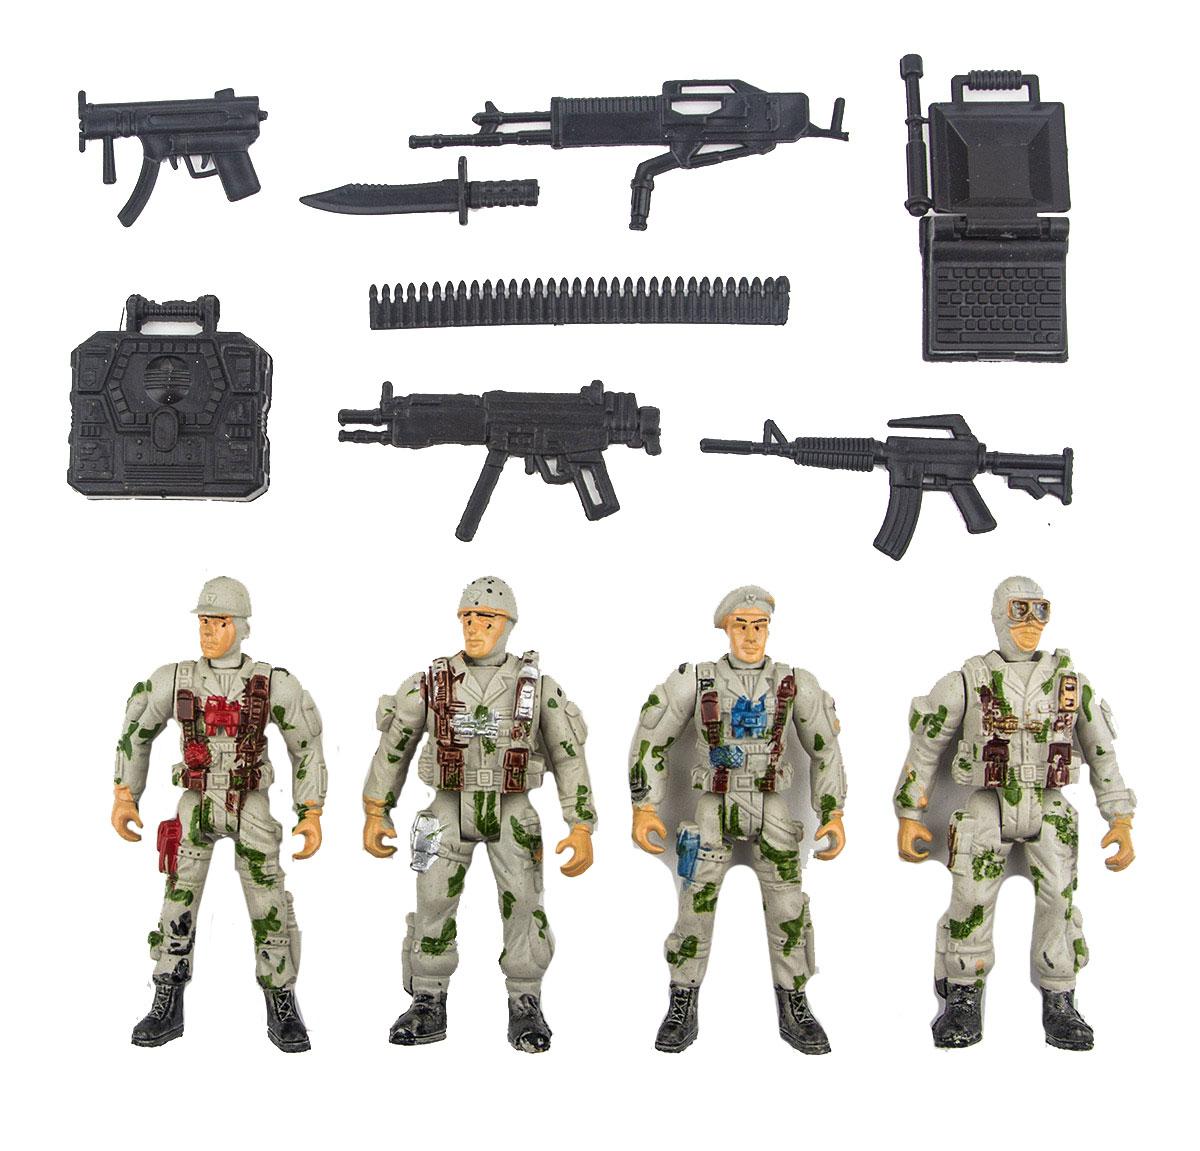 Battletime Набор солдатиков Отряд Гепард battletime пистолет пулемет опустошитель